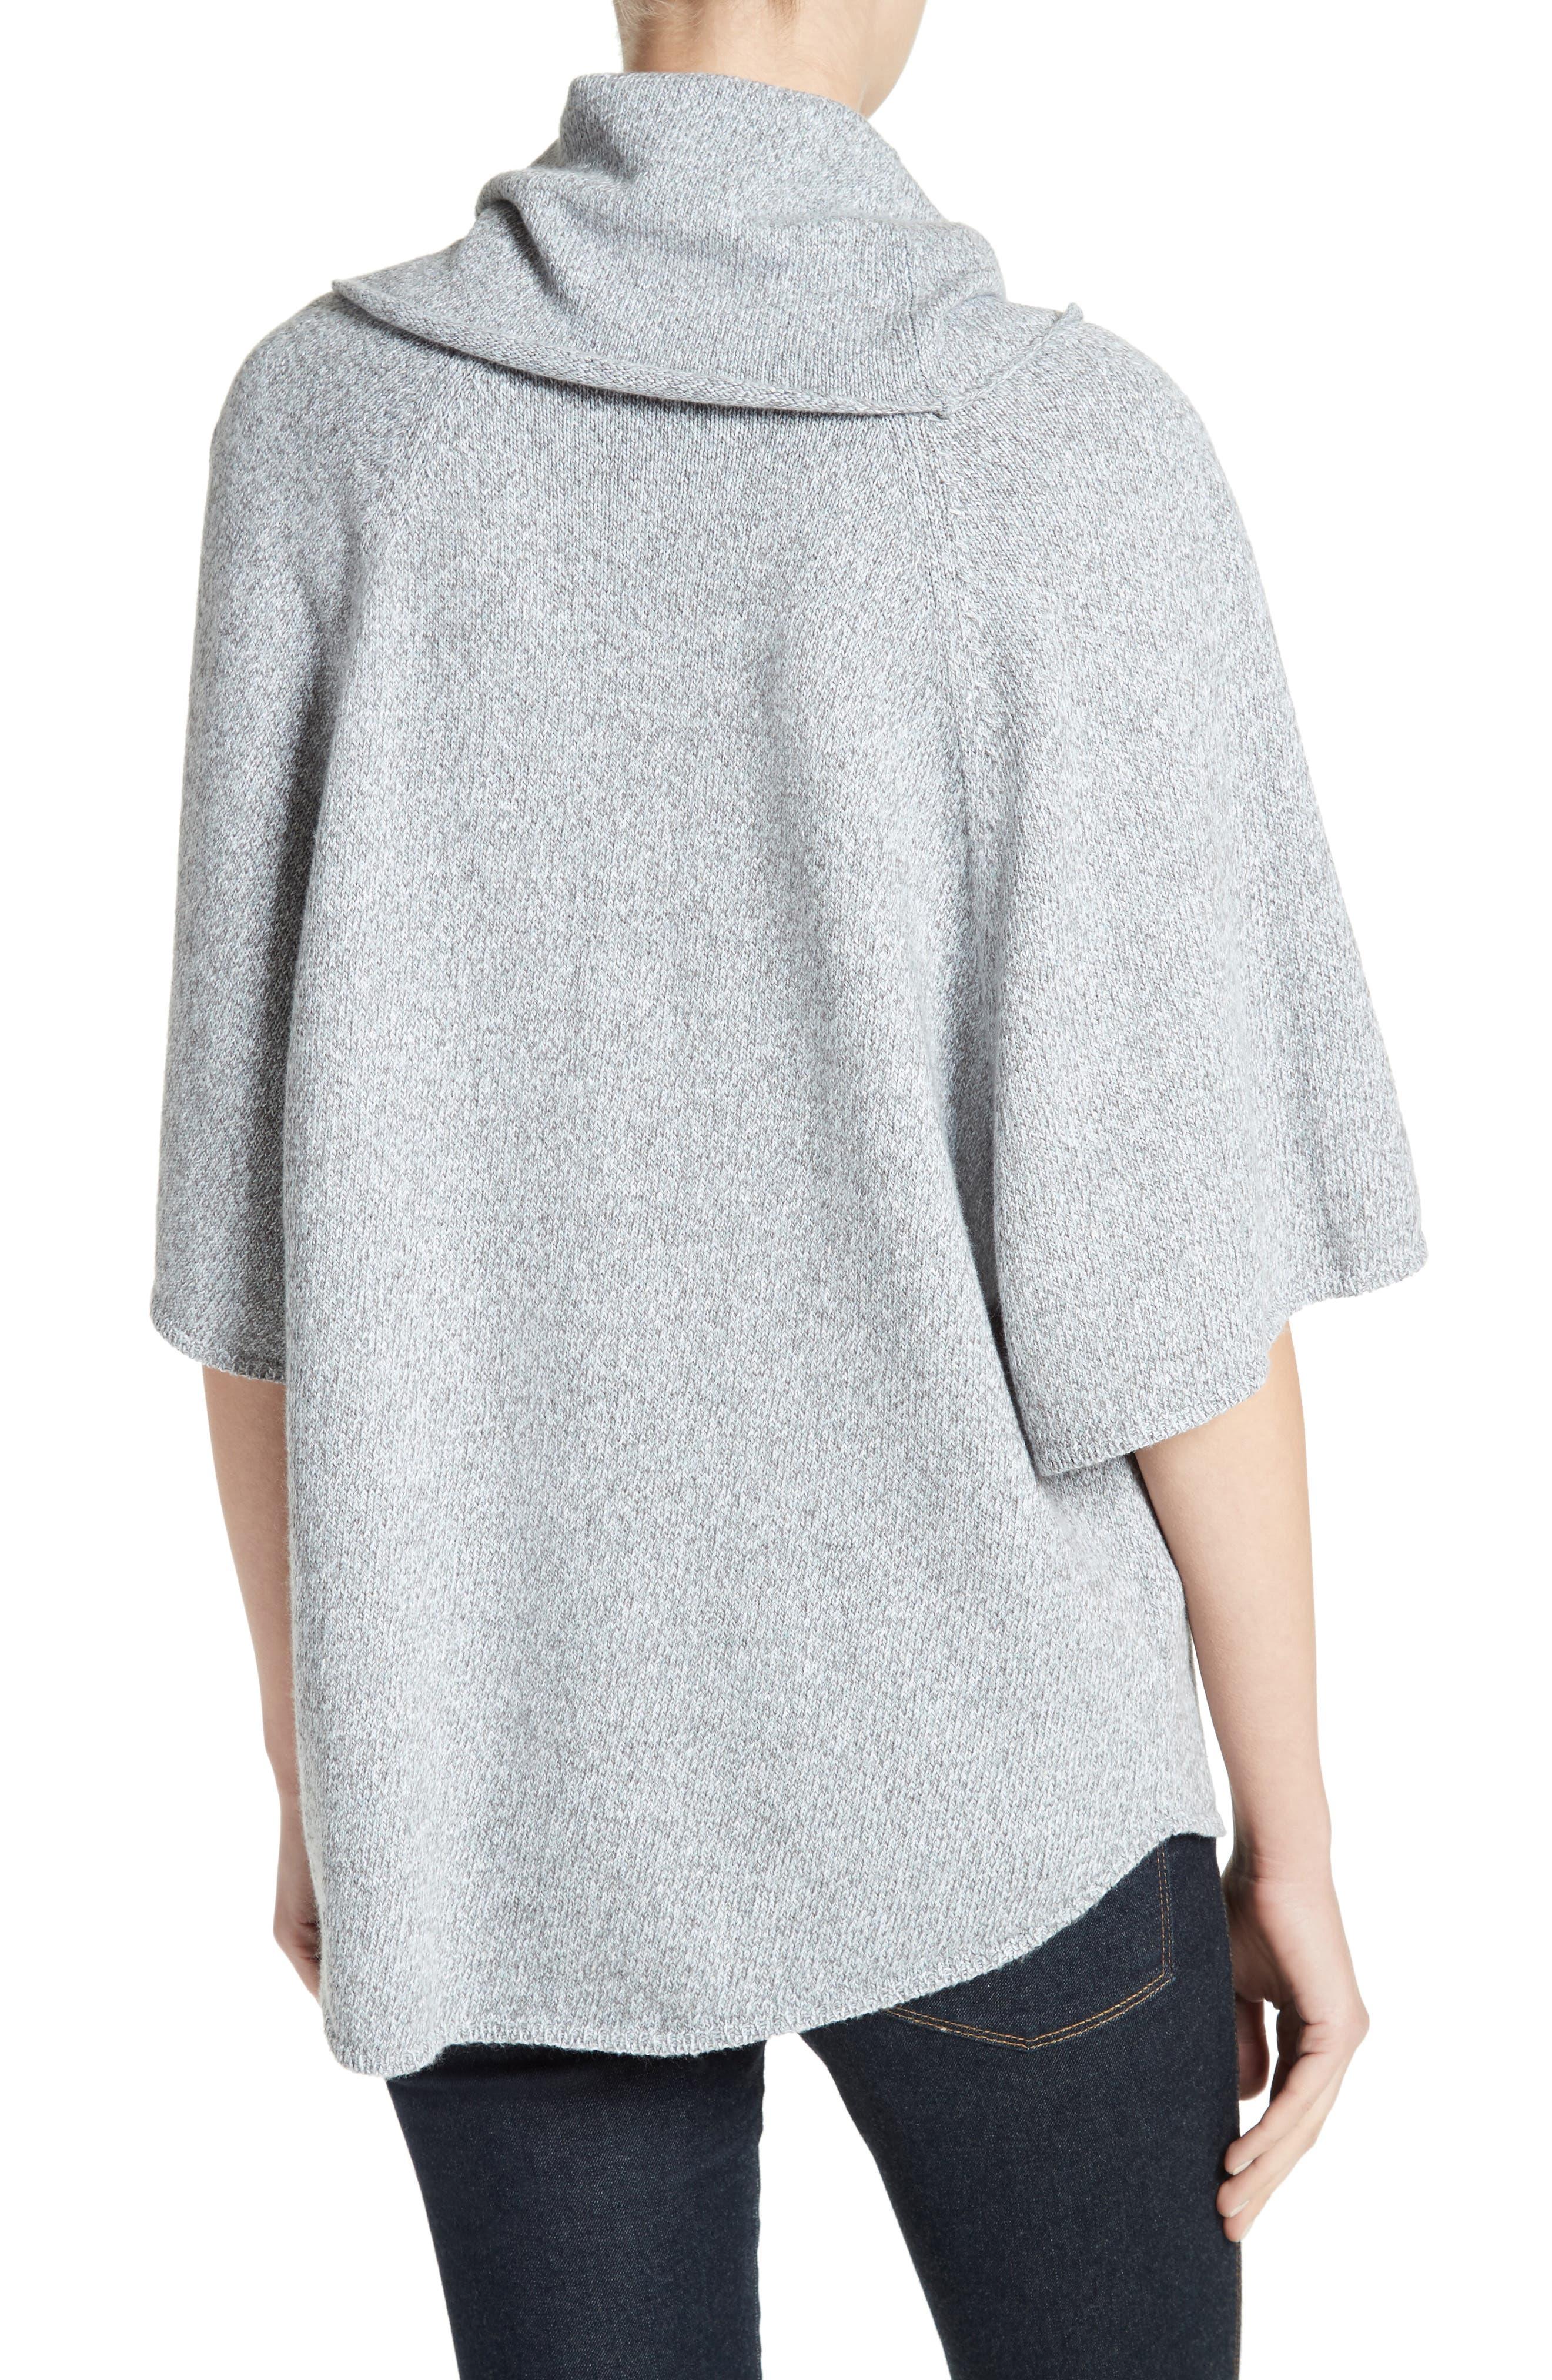 Celia Cowl Neck Sweater,                             Alternate thumbnail 2, color,                             059